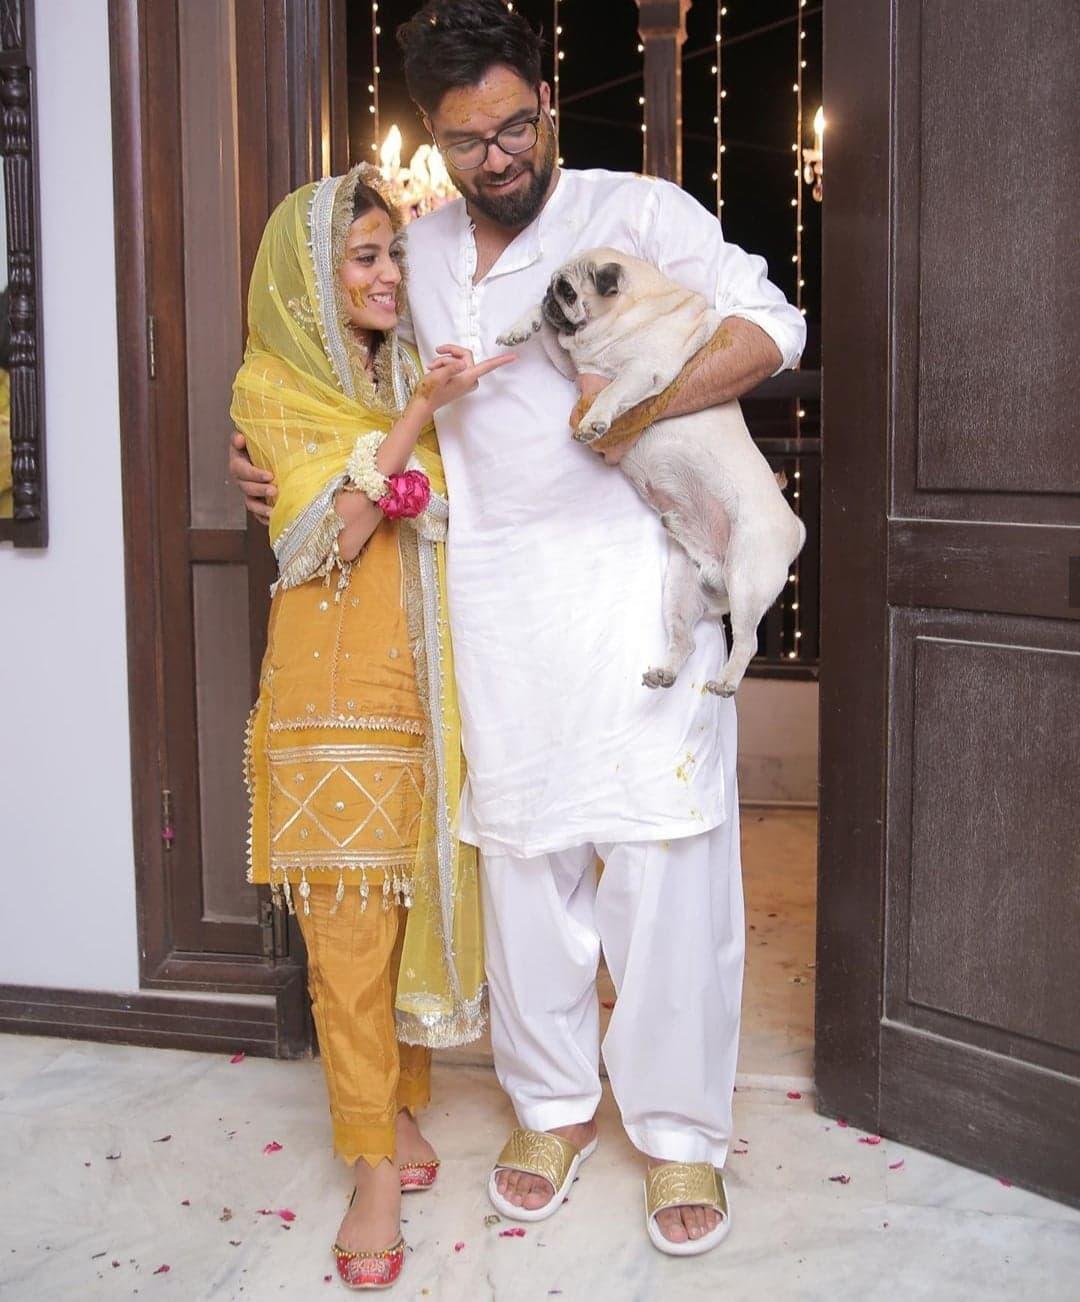 10 Best Things About Iqra Aziz & Yasir Hussain's Wedding